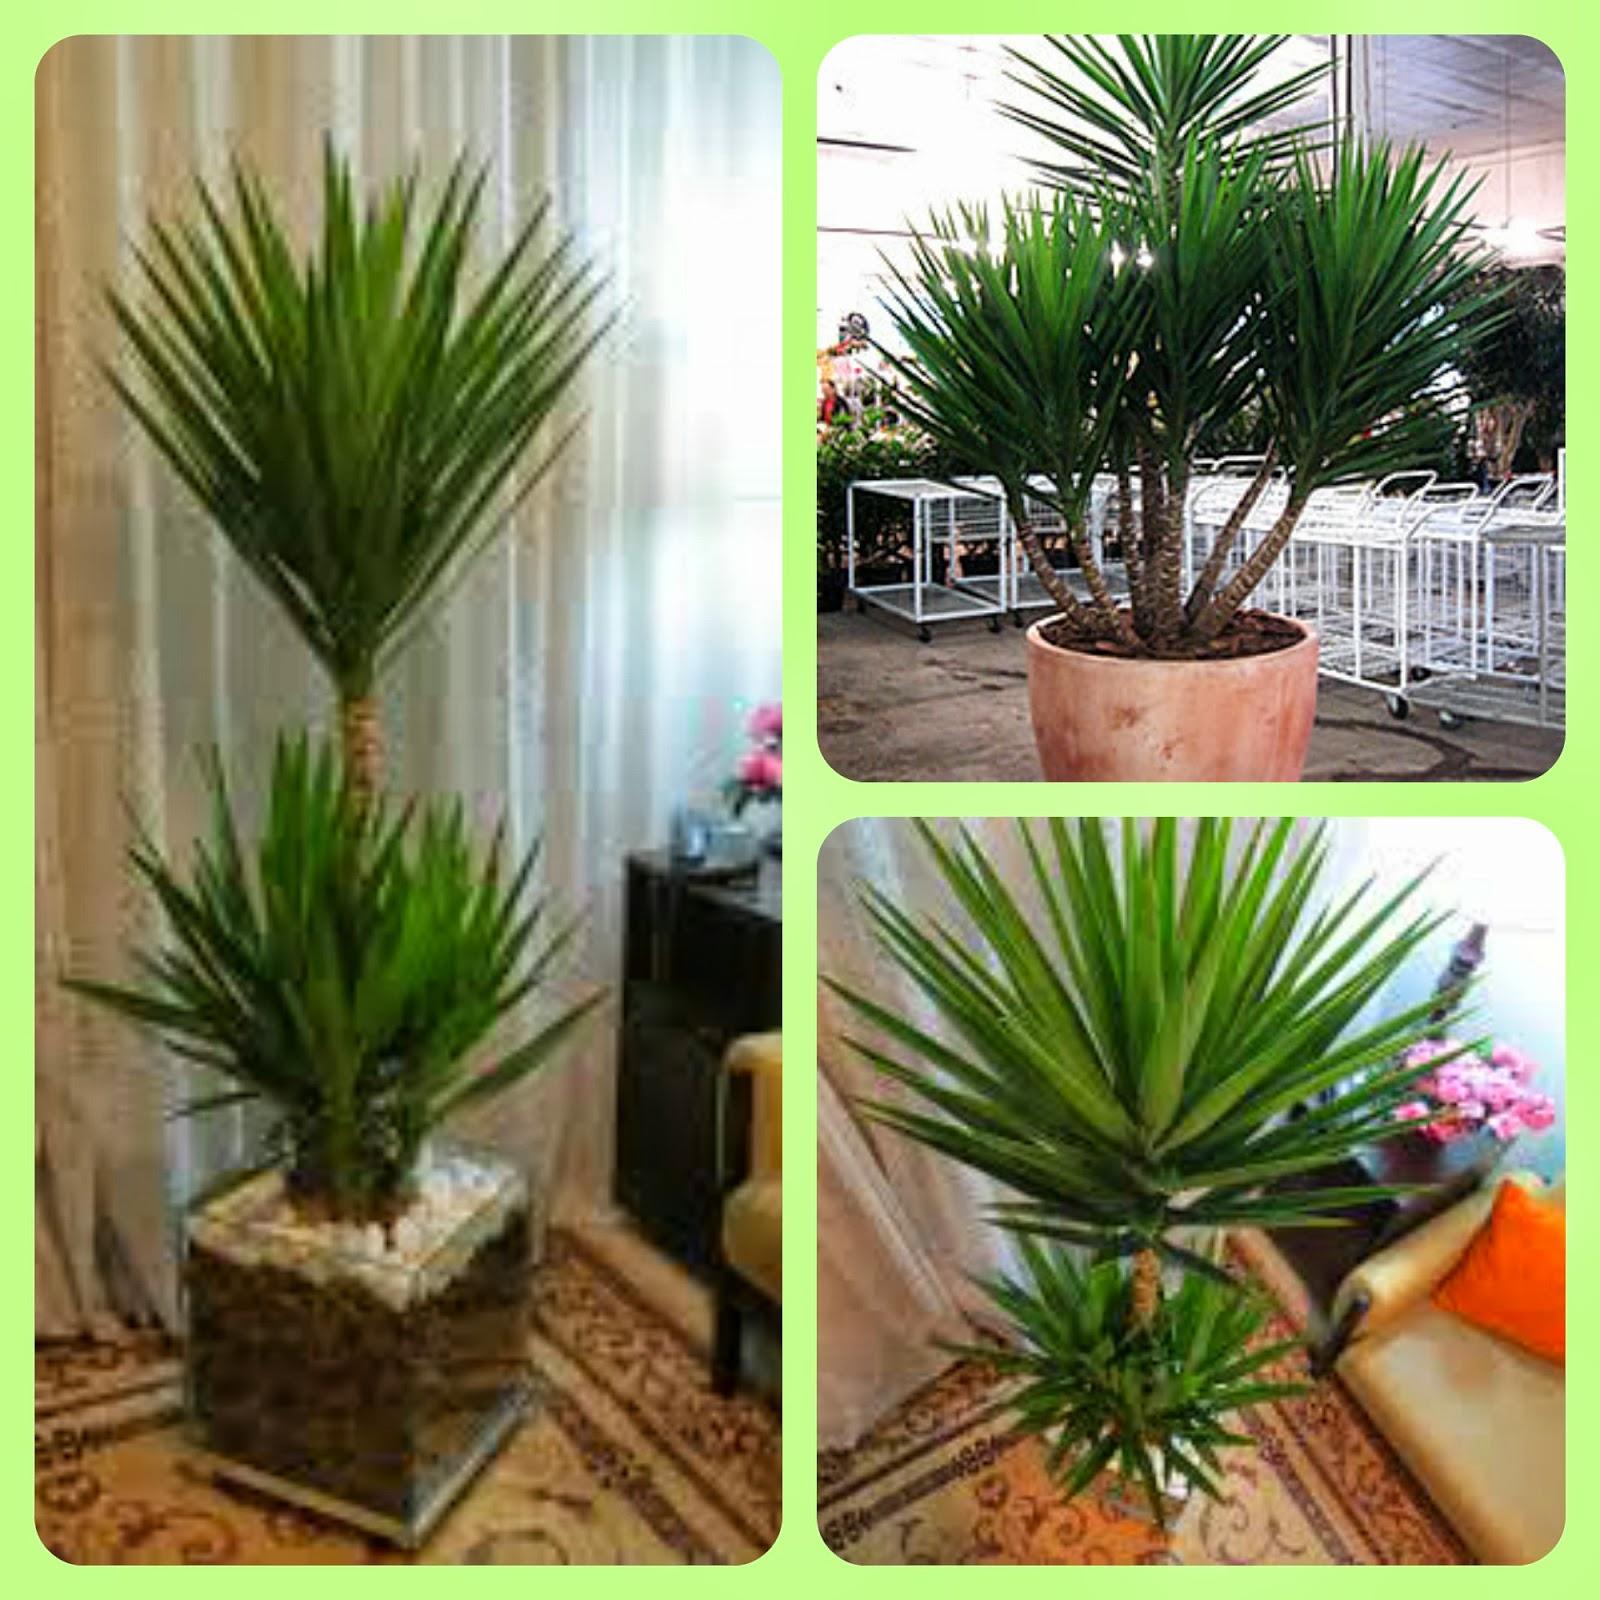 Casa das plantas stunning cantinho das plantas vasos for Plantas de casa adentro